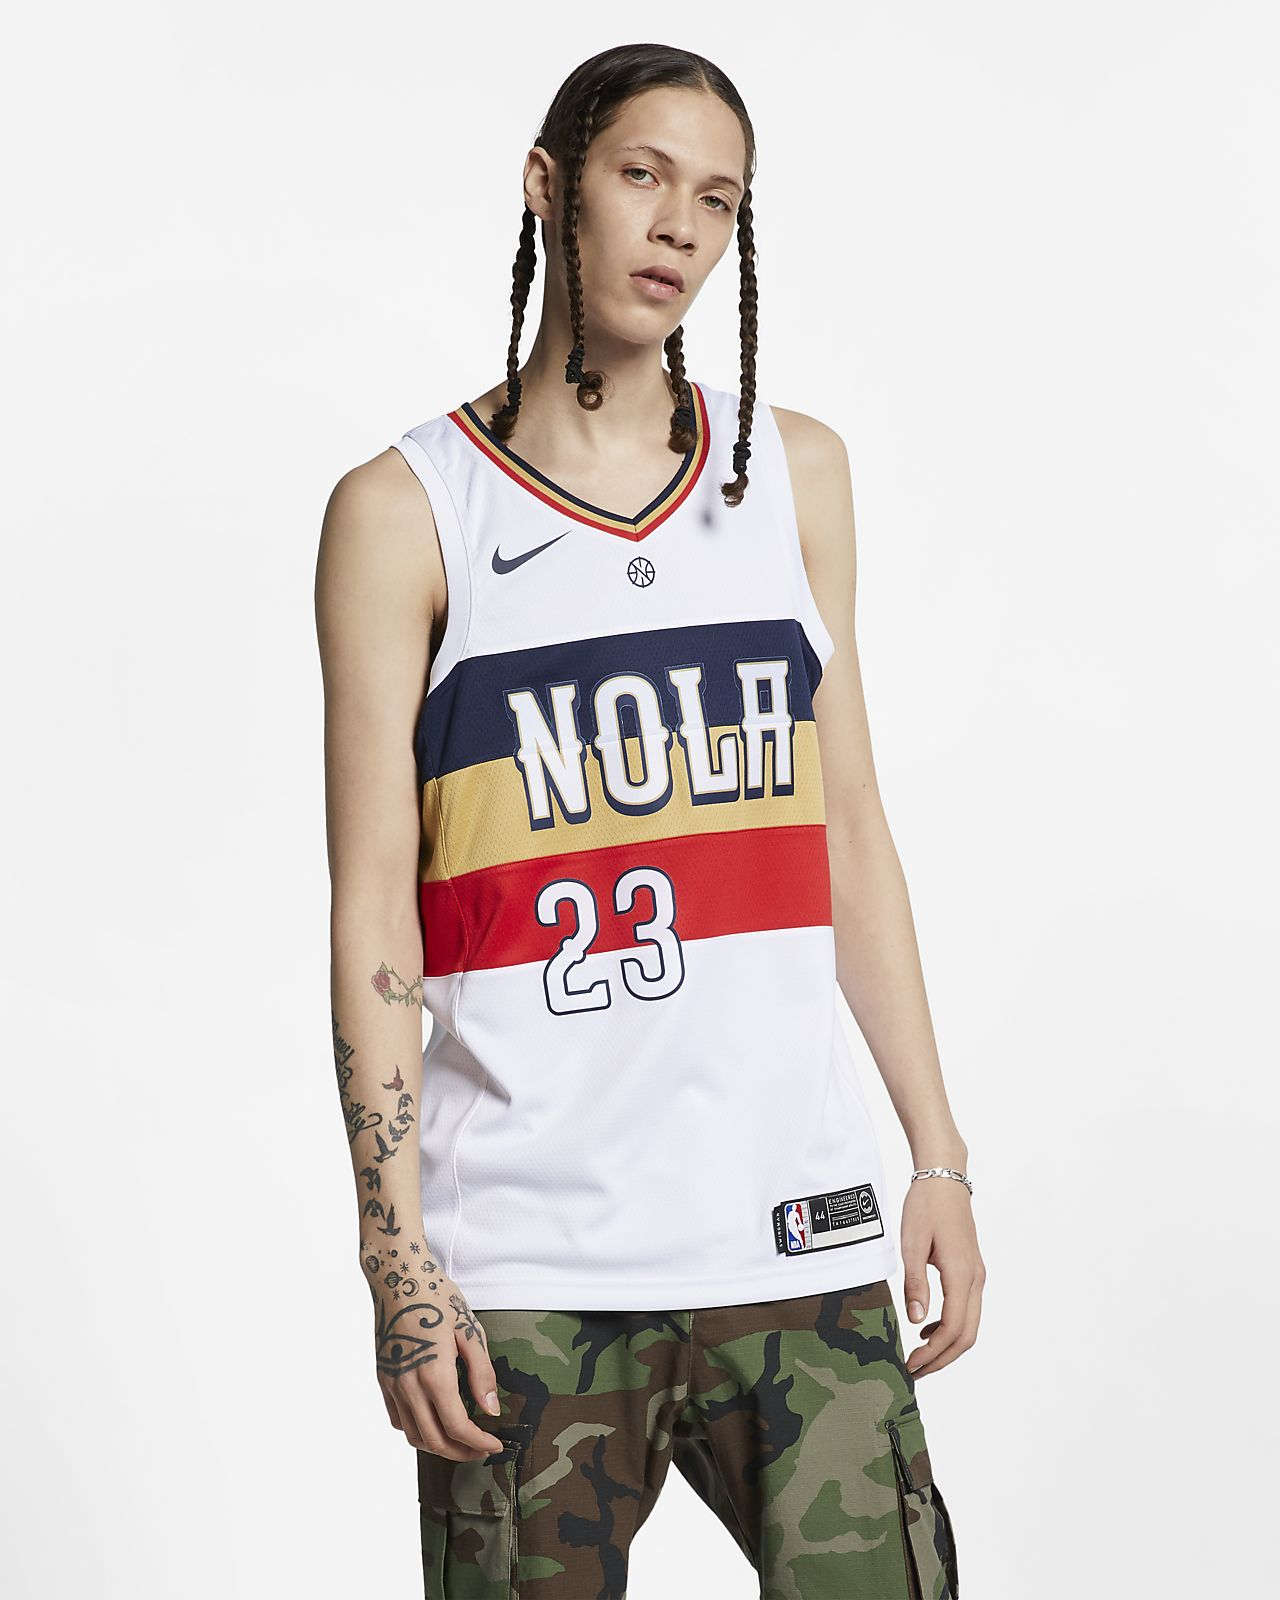 Anthony Davis (nba) Earned City Edition Swingman (New Orleans Pelicans) Nike NBA Connected férfimez